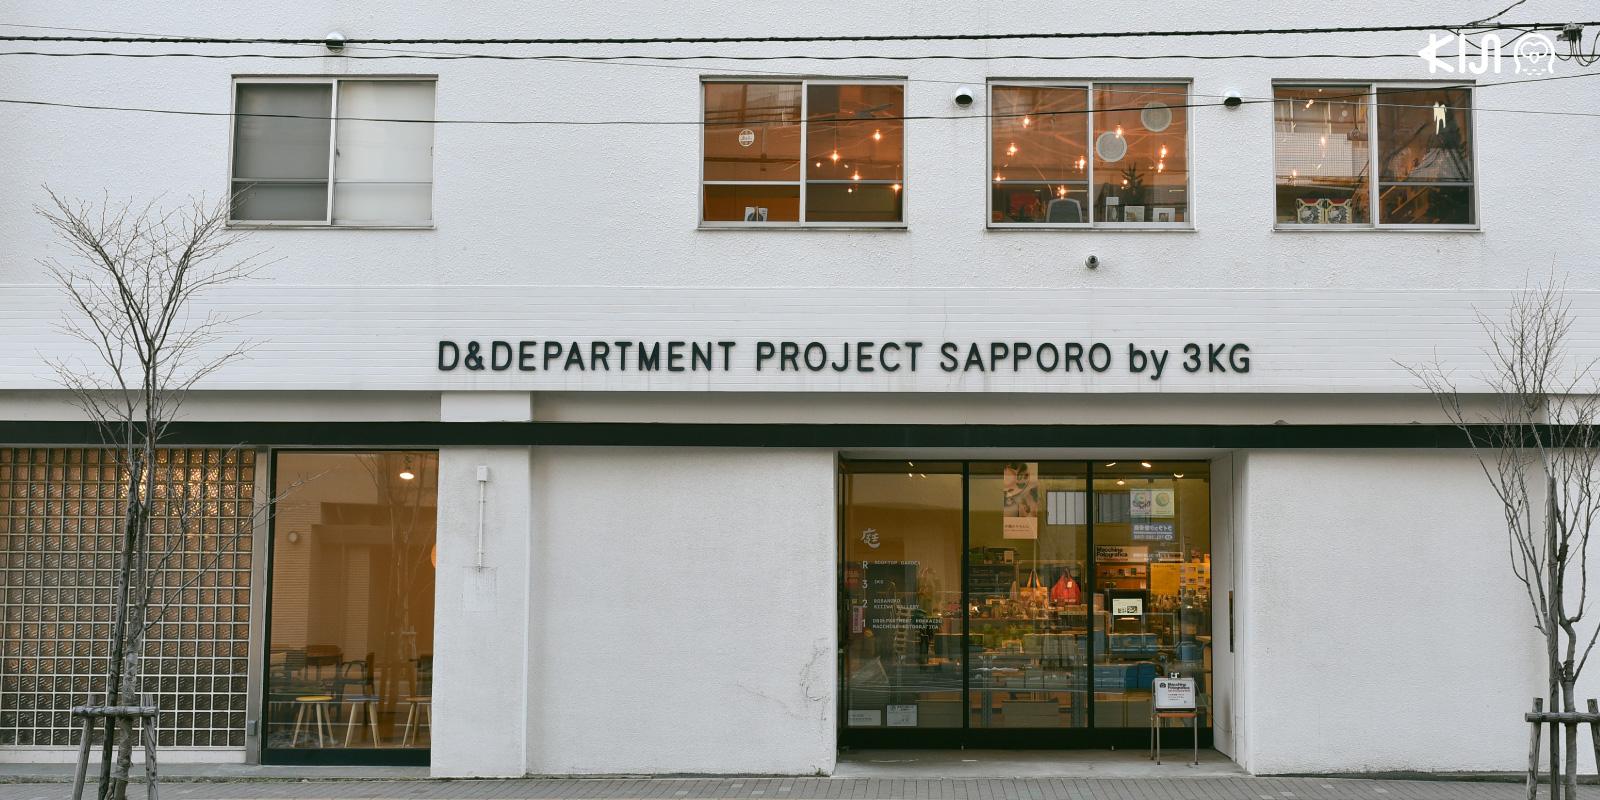 D & DEPARTMENT at Sapporo, Hokkaido